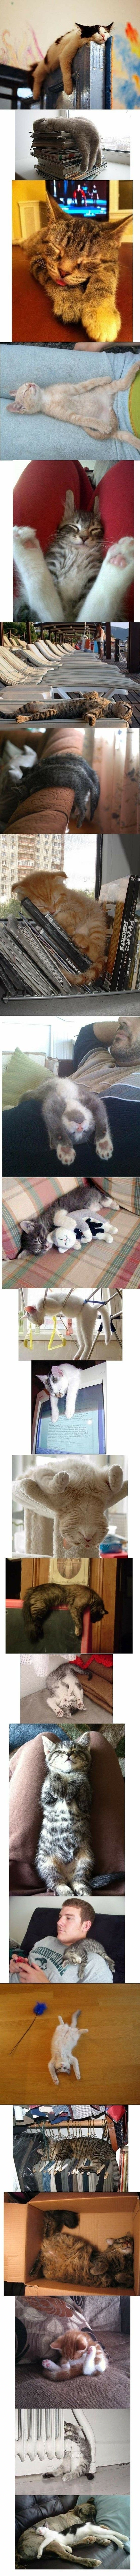 Сладкий сон кошек